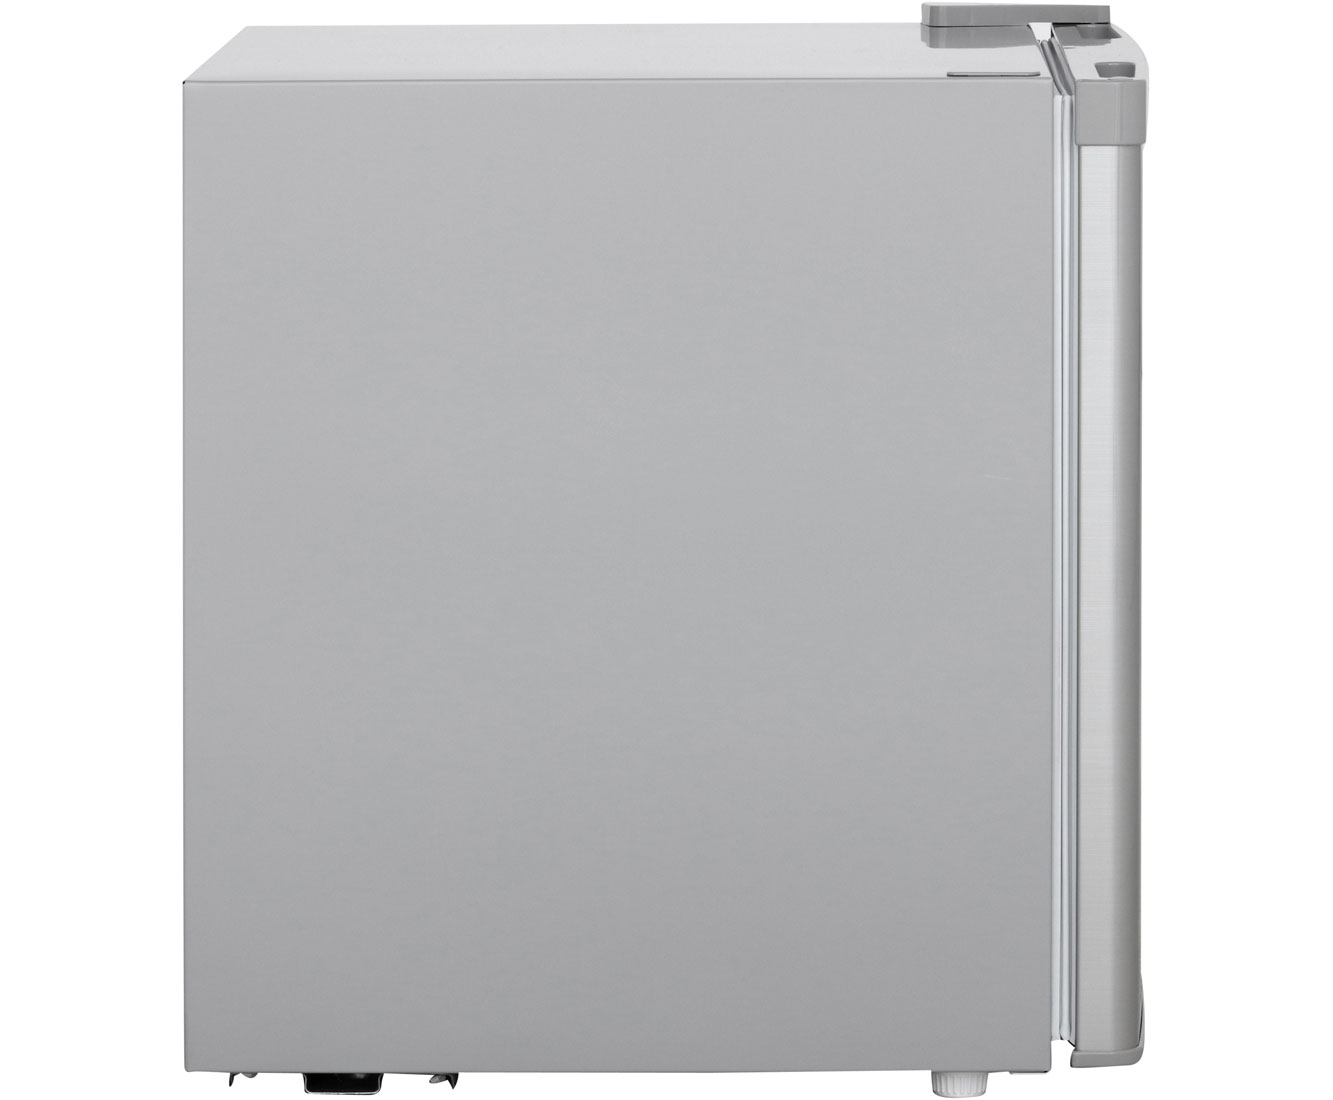 Bomann Mini Kühlschrank Saturn : Bomann kb kühlschrank freistehend cm weiß neu ebay